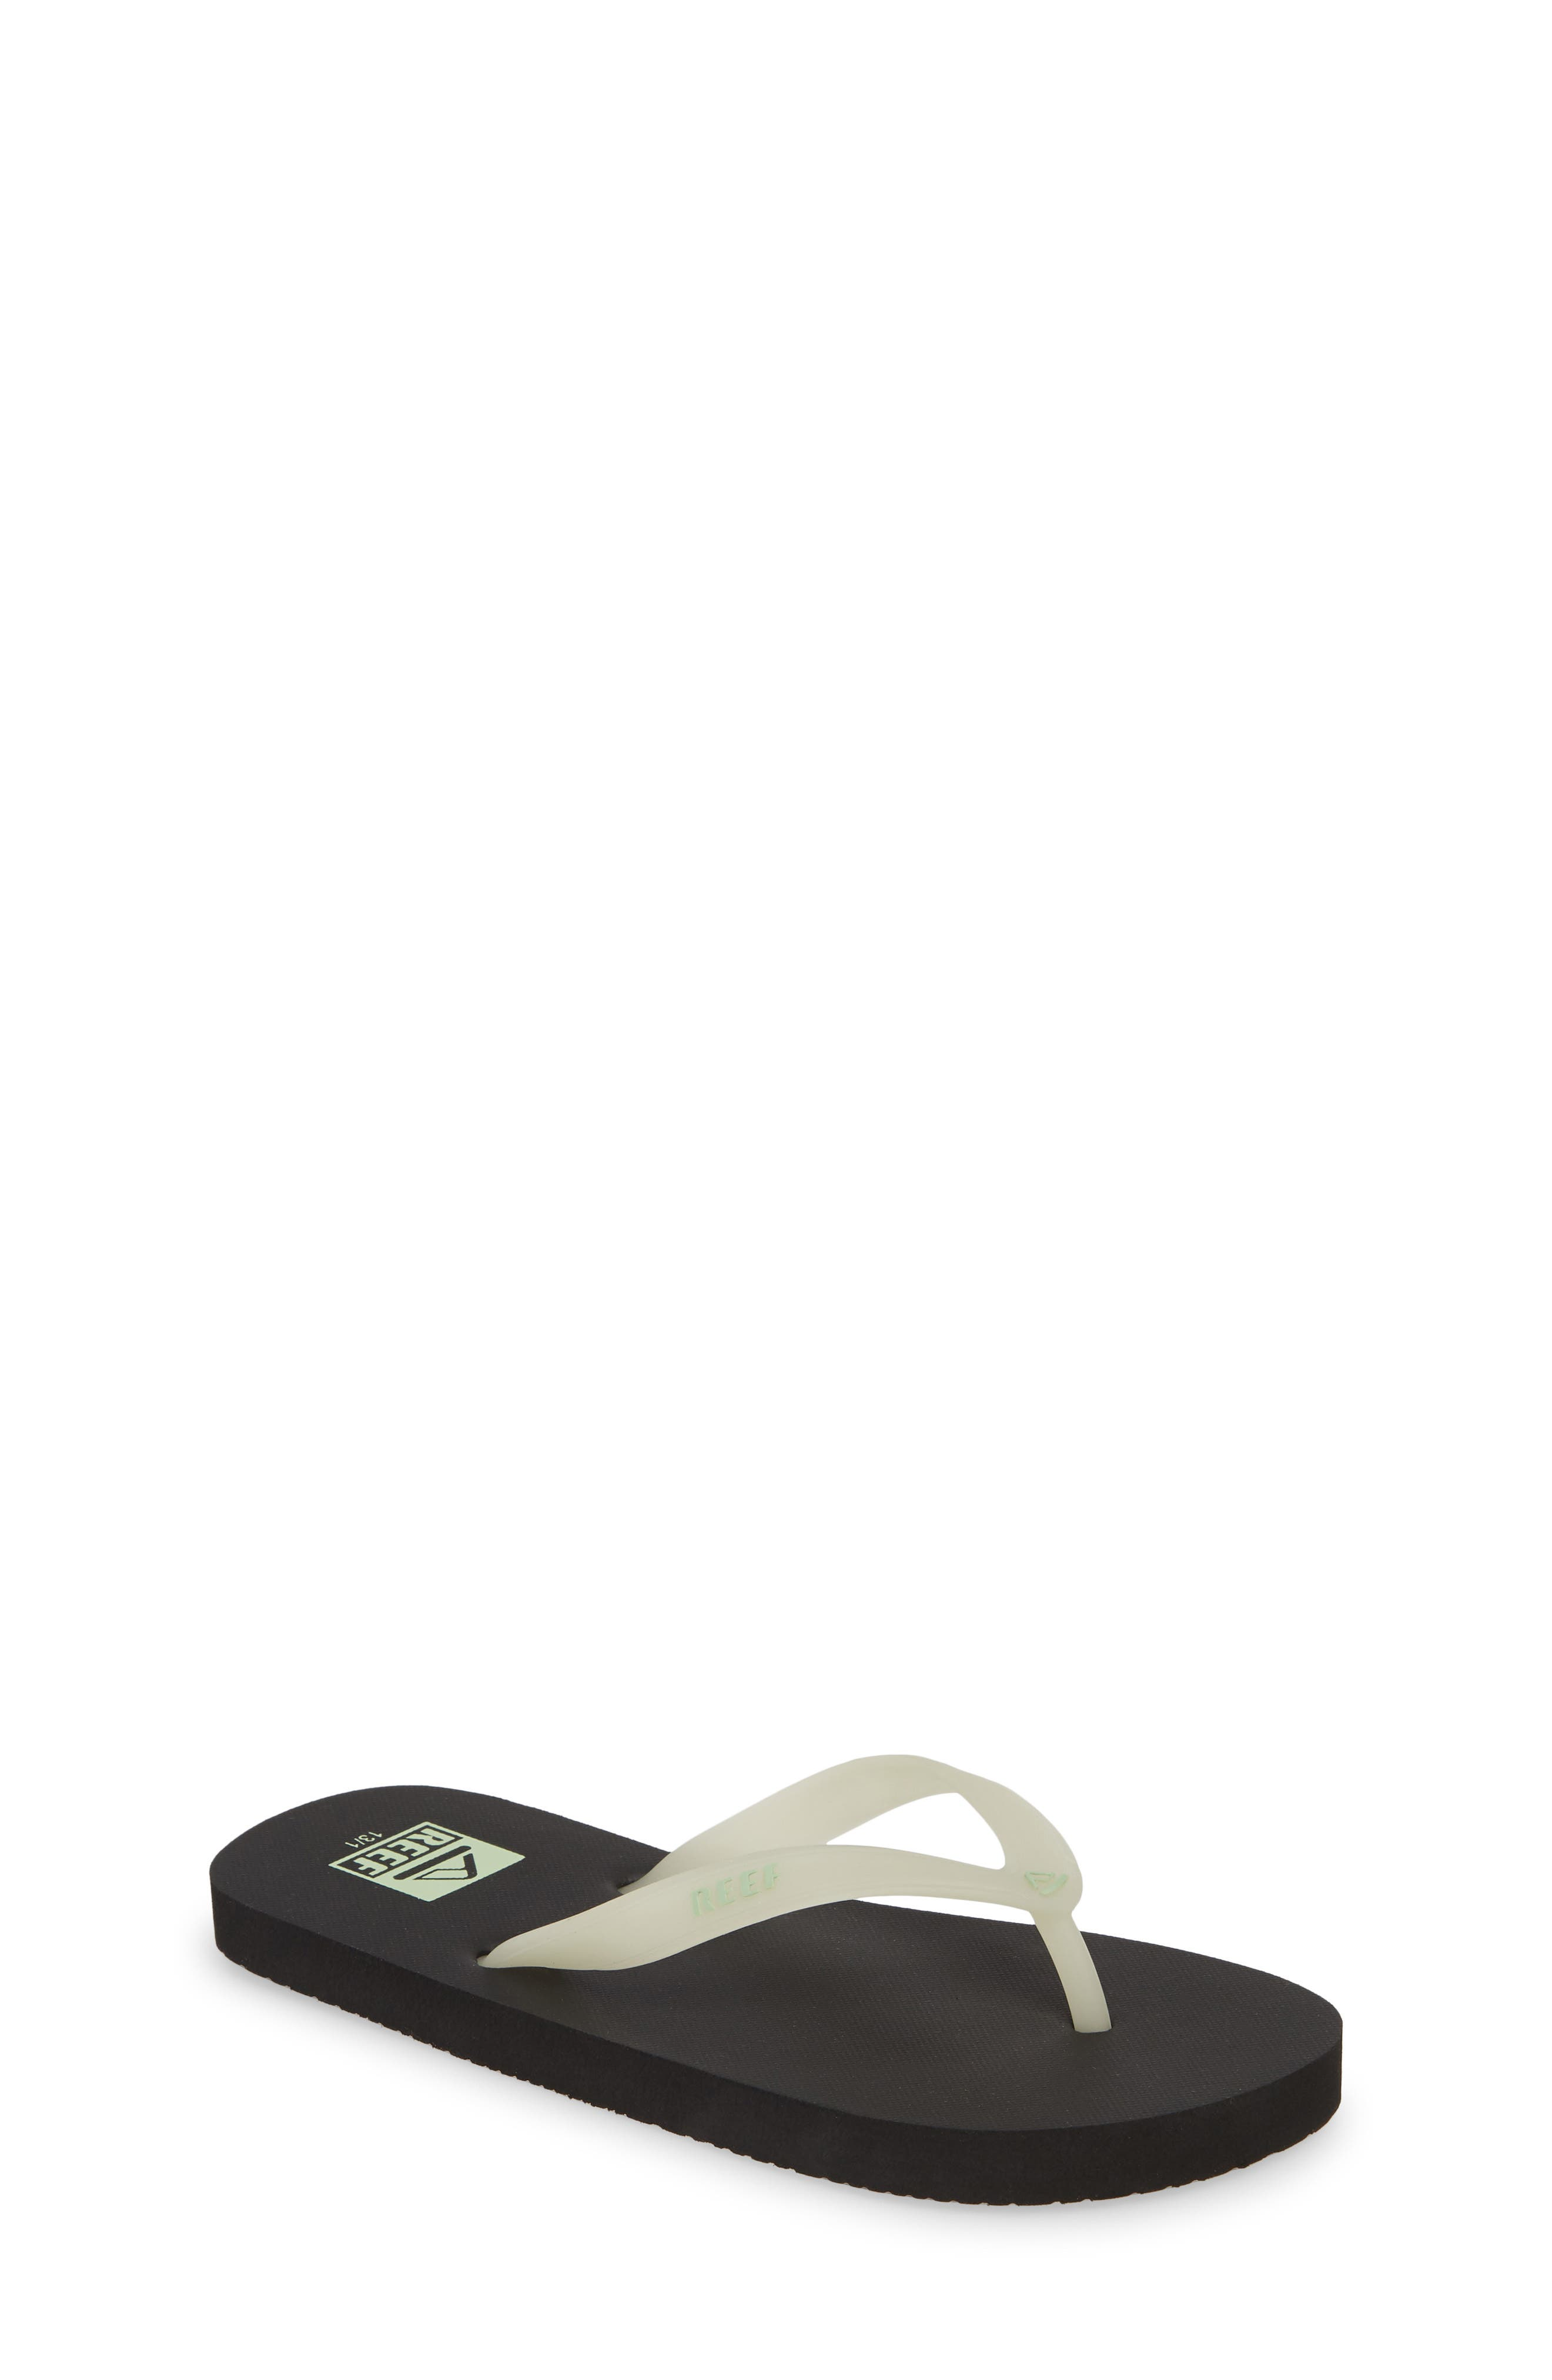 REEF, Switchfoot Glow Flip Flop, Main thumbnail 1, color, BLACK GLOW